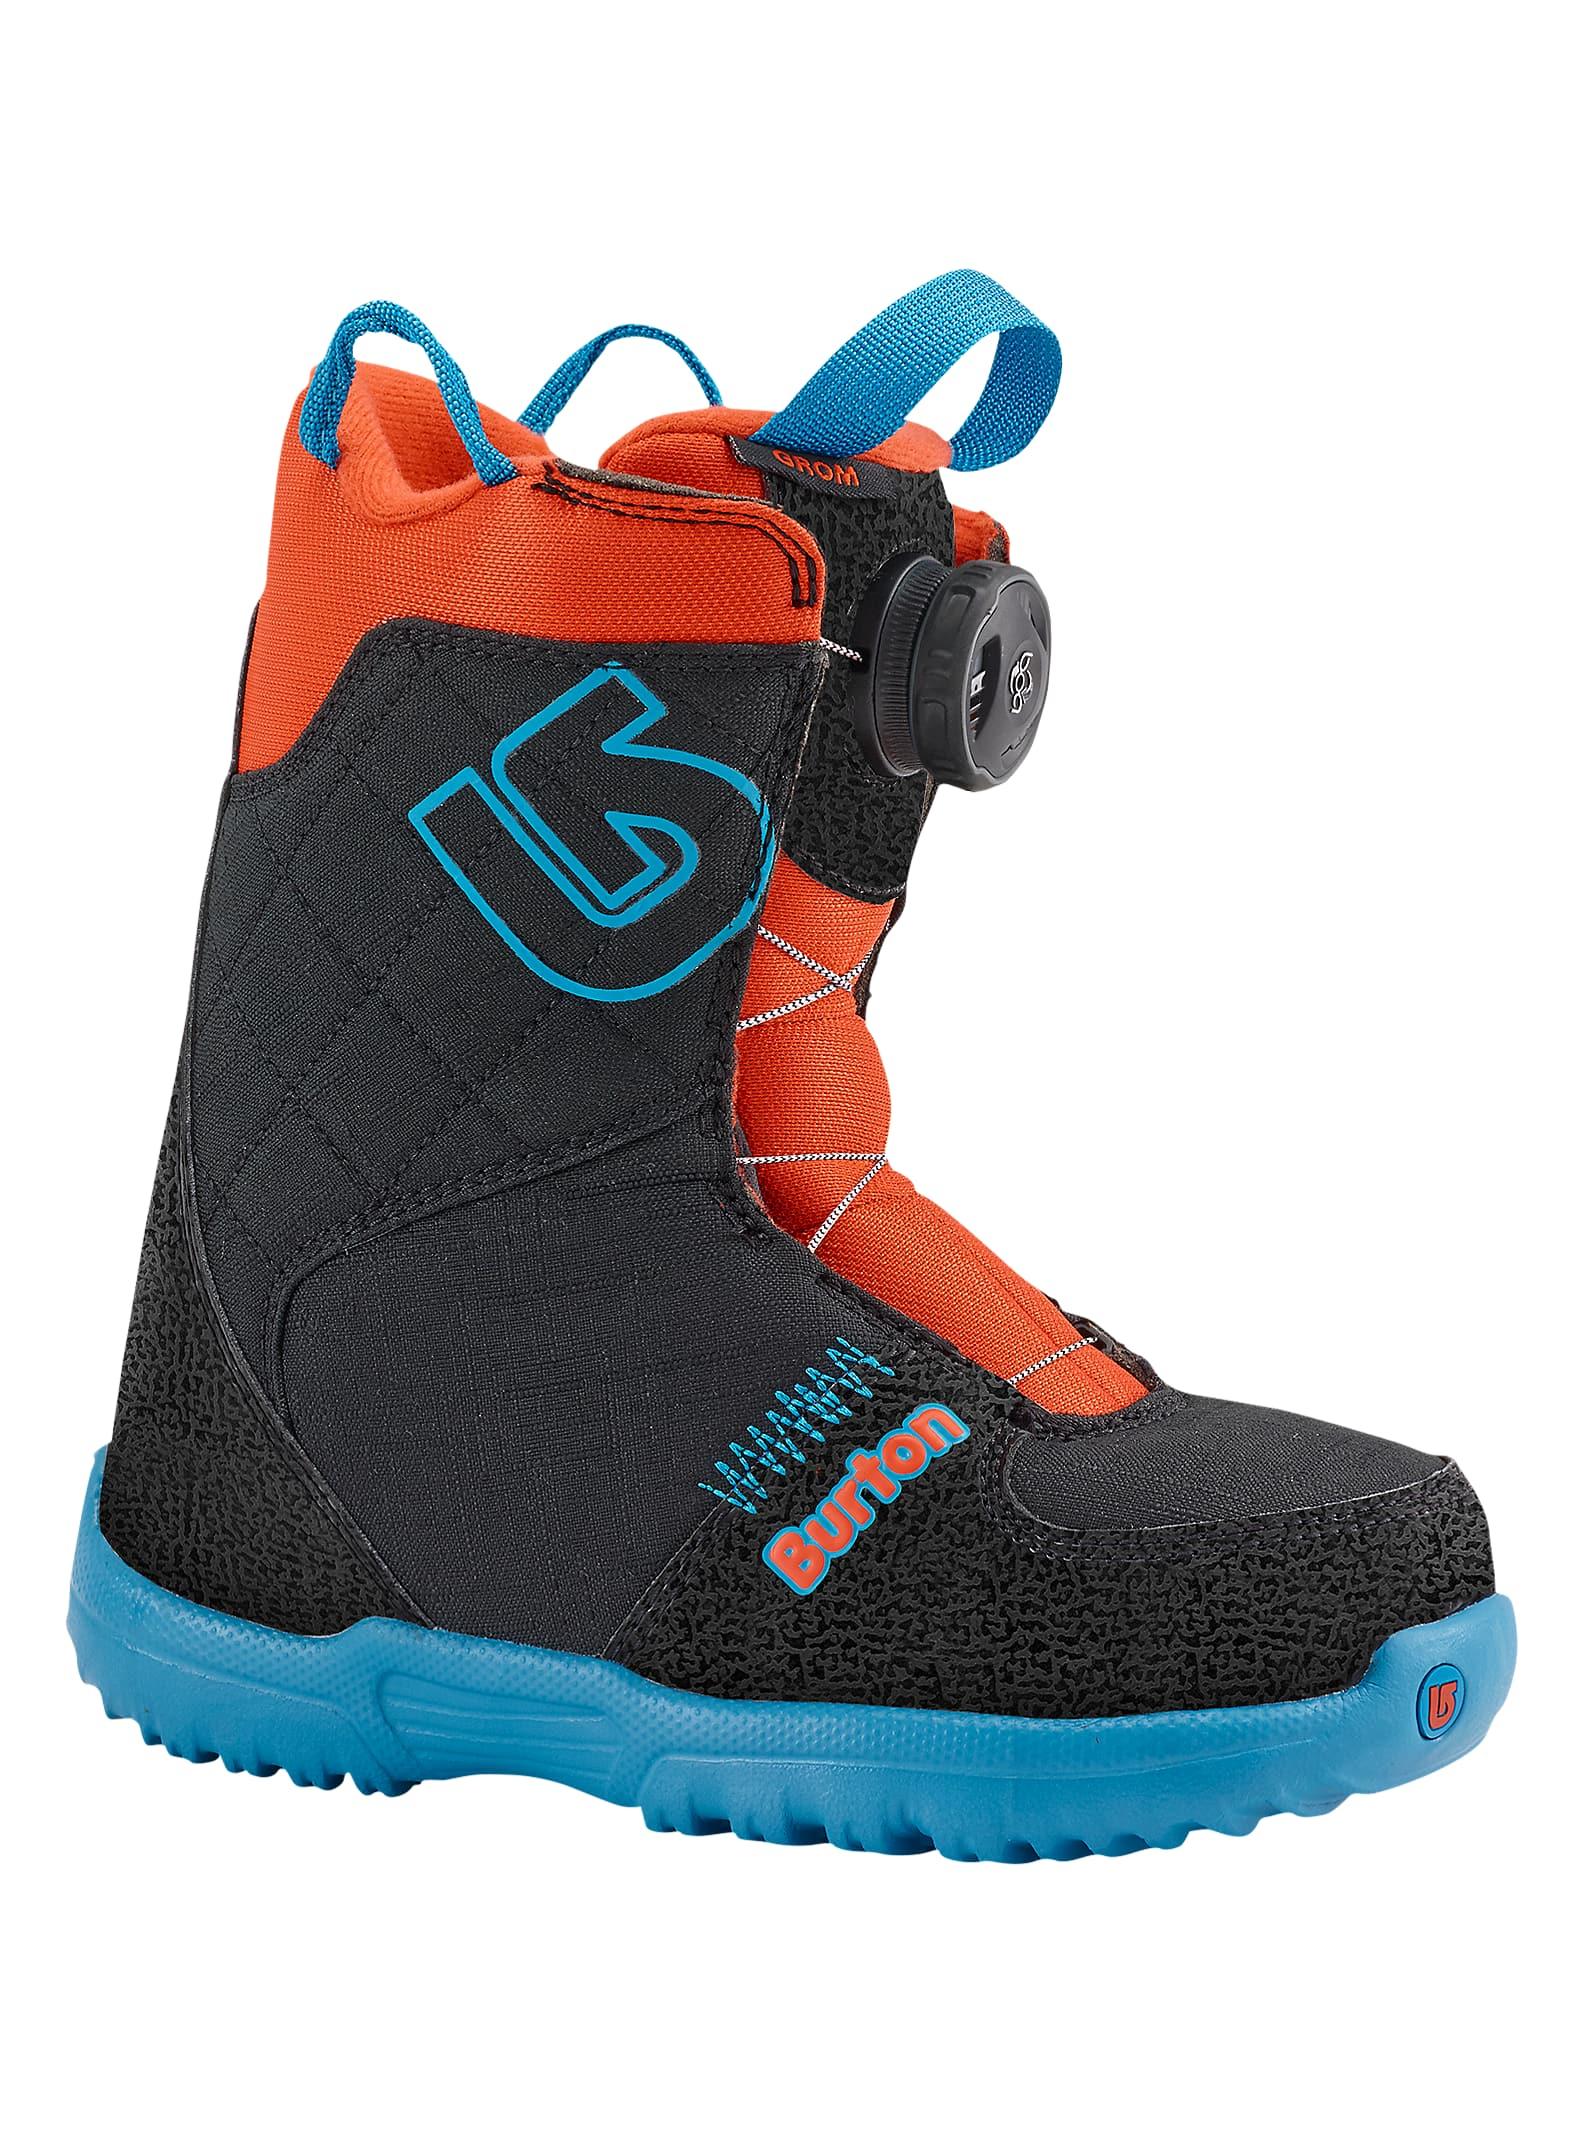 3a6c269aedcc Burton Grom Boa® Snowboard Boot | Burton Snowboards Winter 16